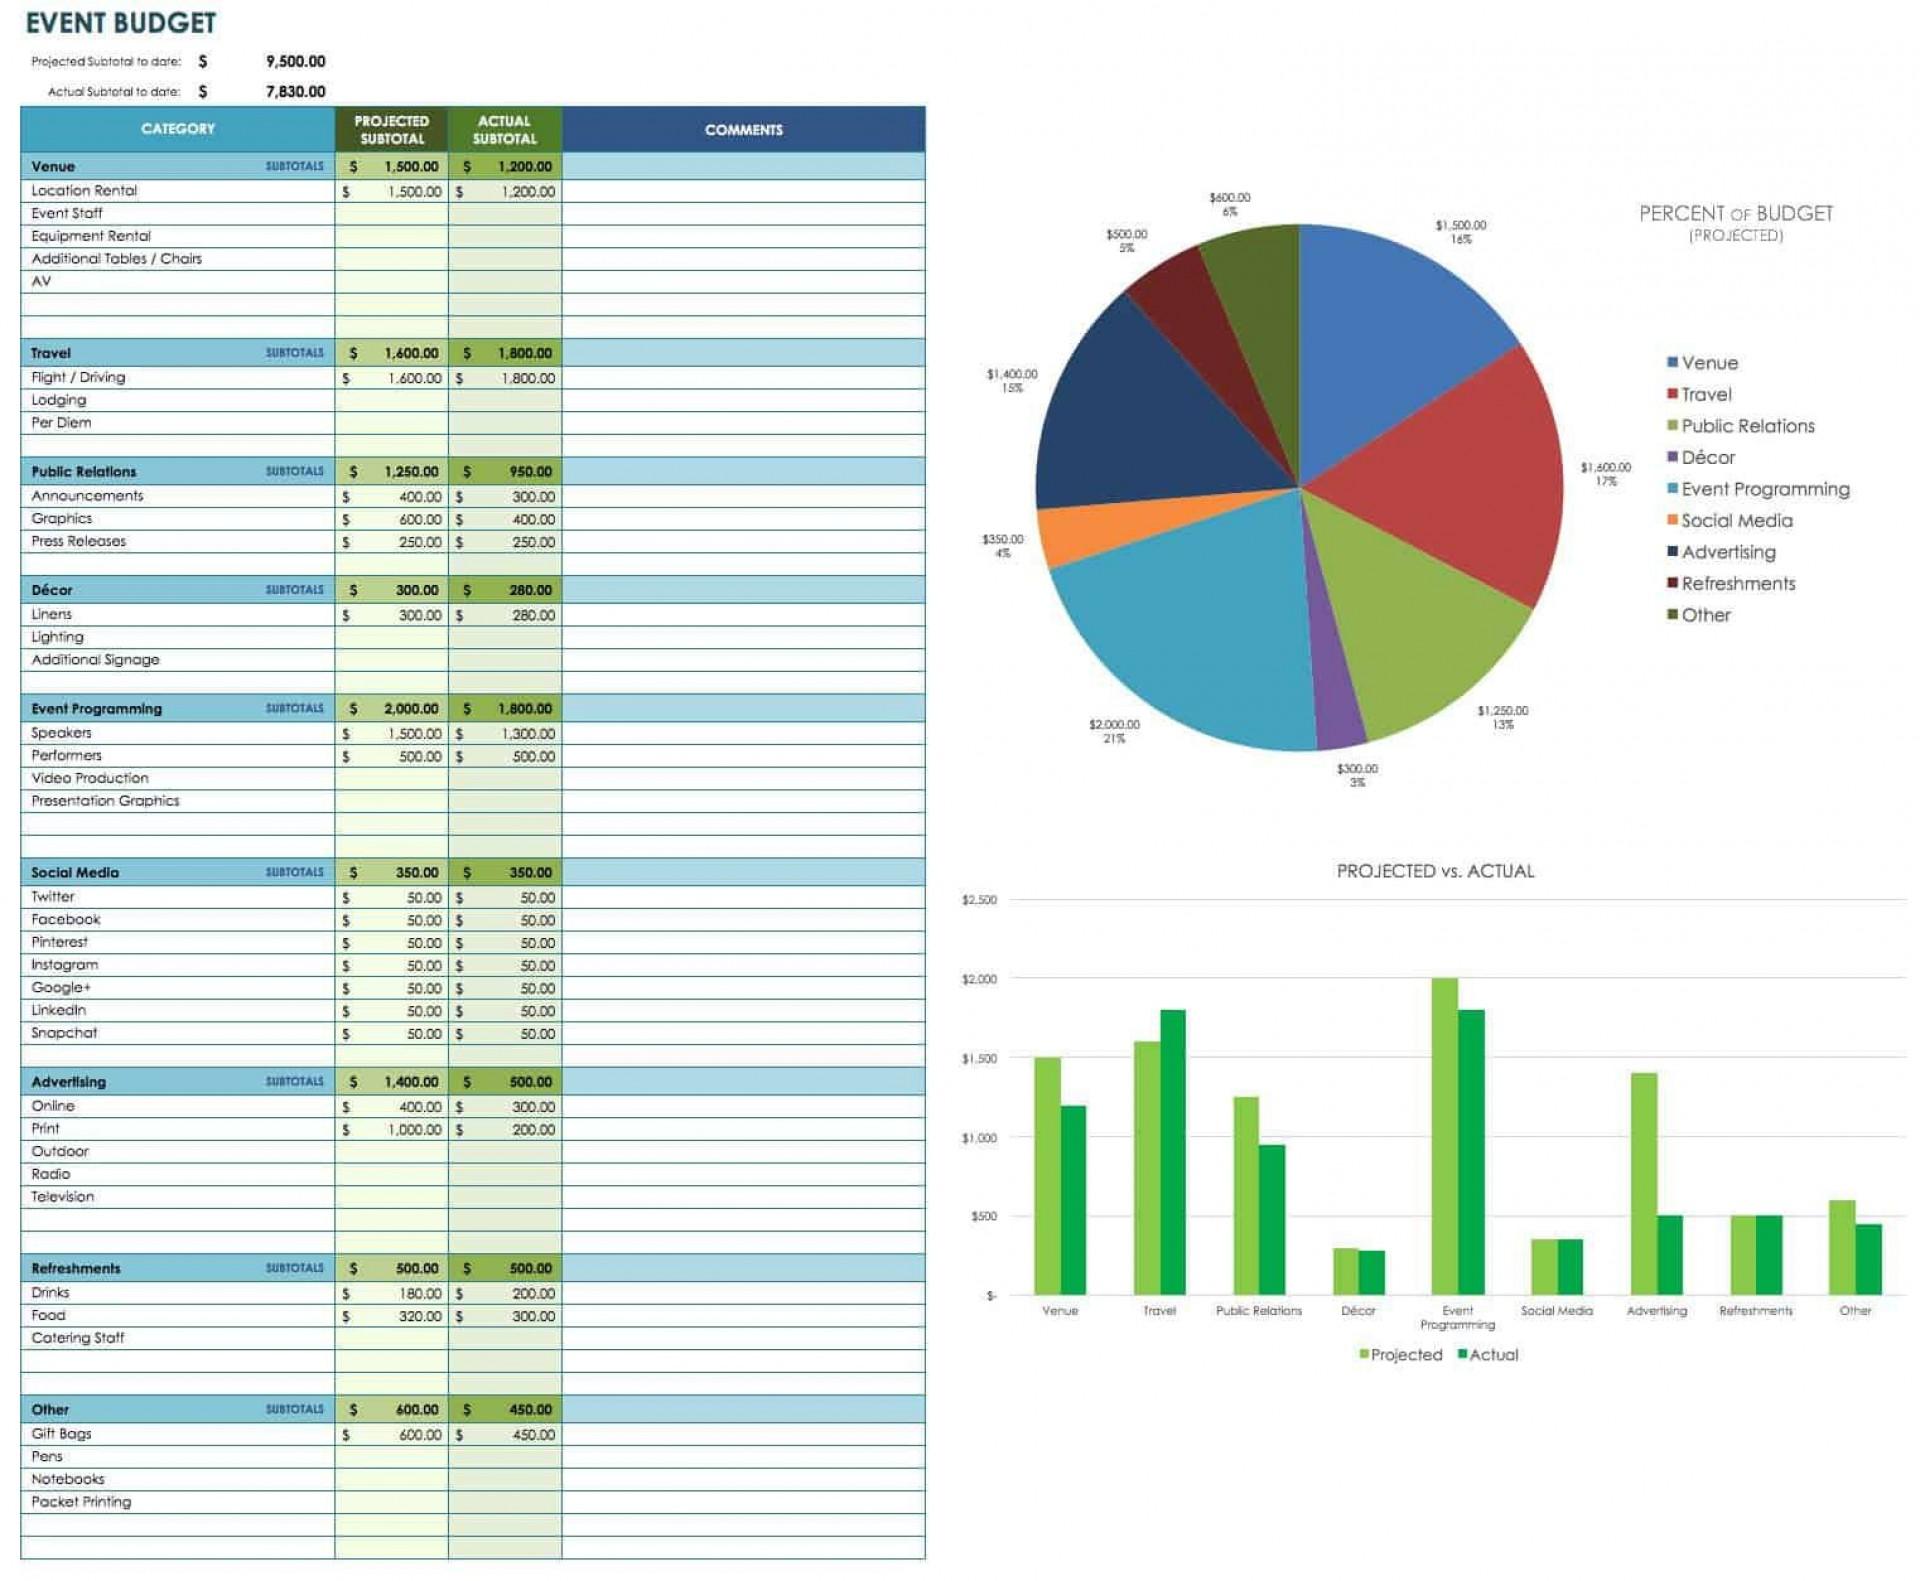 007 Staggering Event Planning Budget Worksheet Template Sample  Free Download Planner Spreadsheet1920